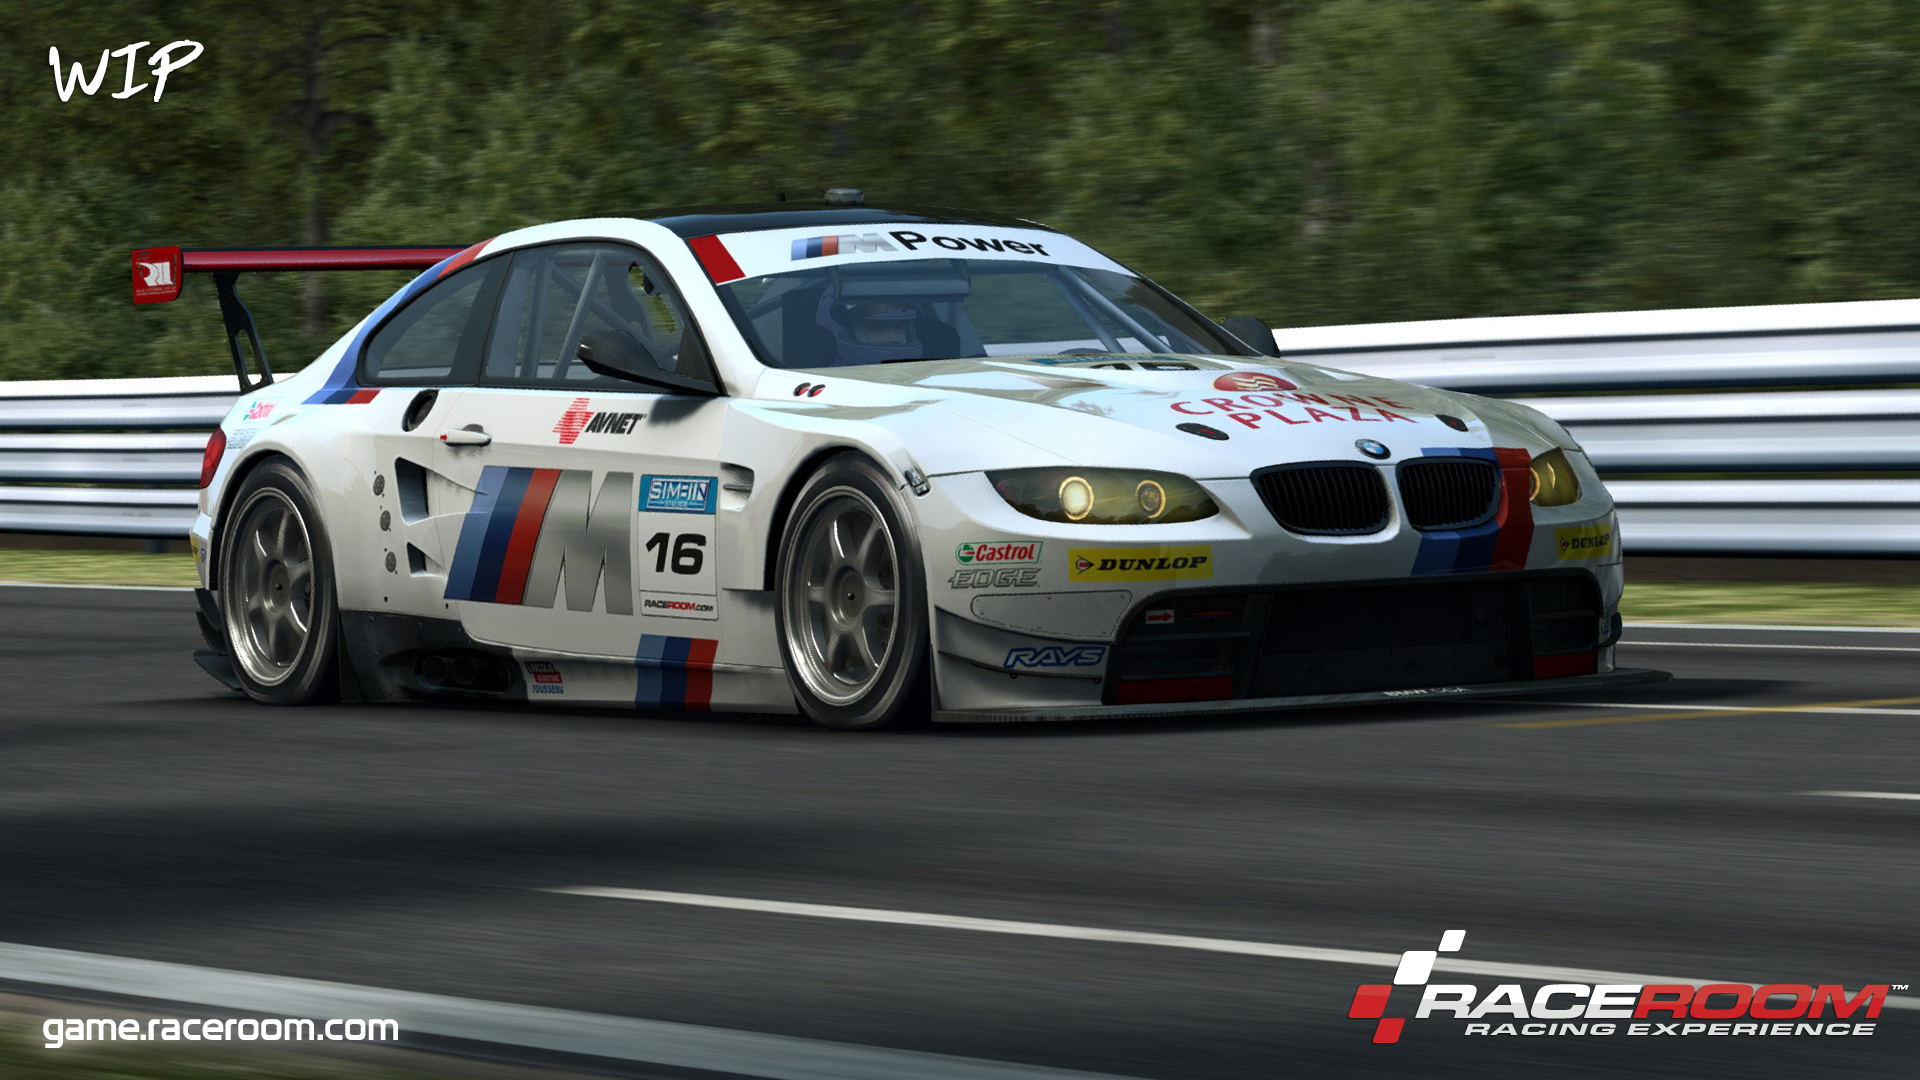 R3e Bmw E92 M3 Gt2 Announced Virtualr Net Sim Racing